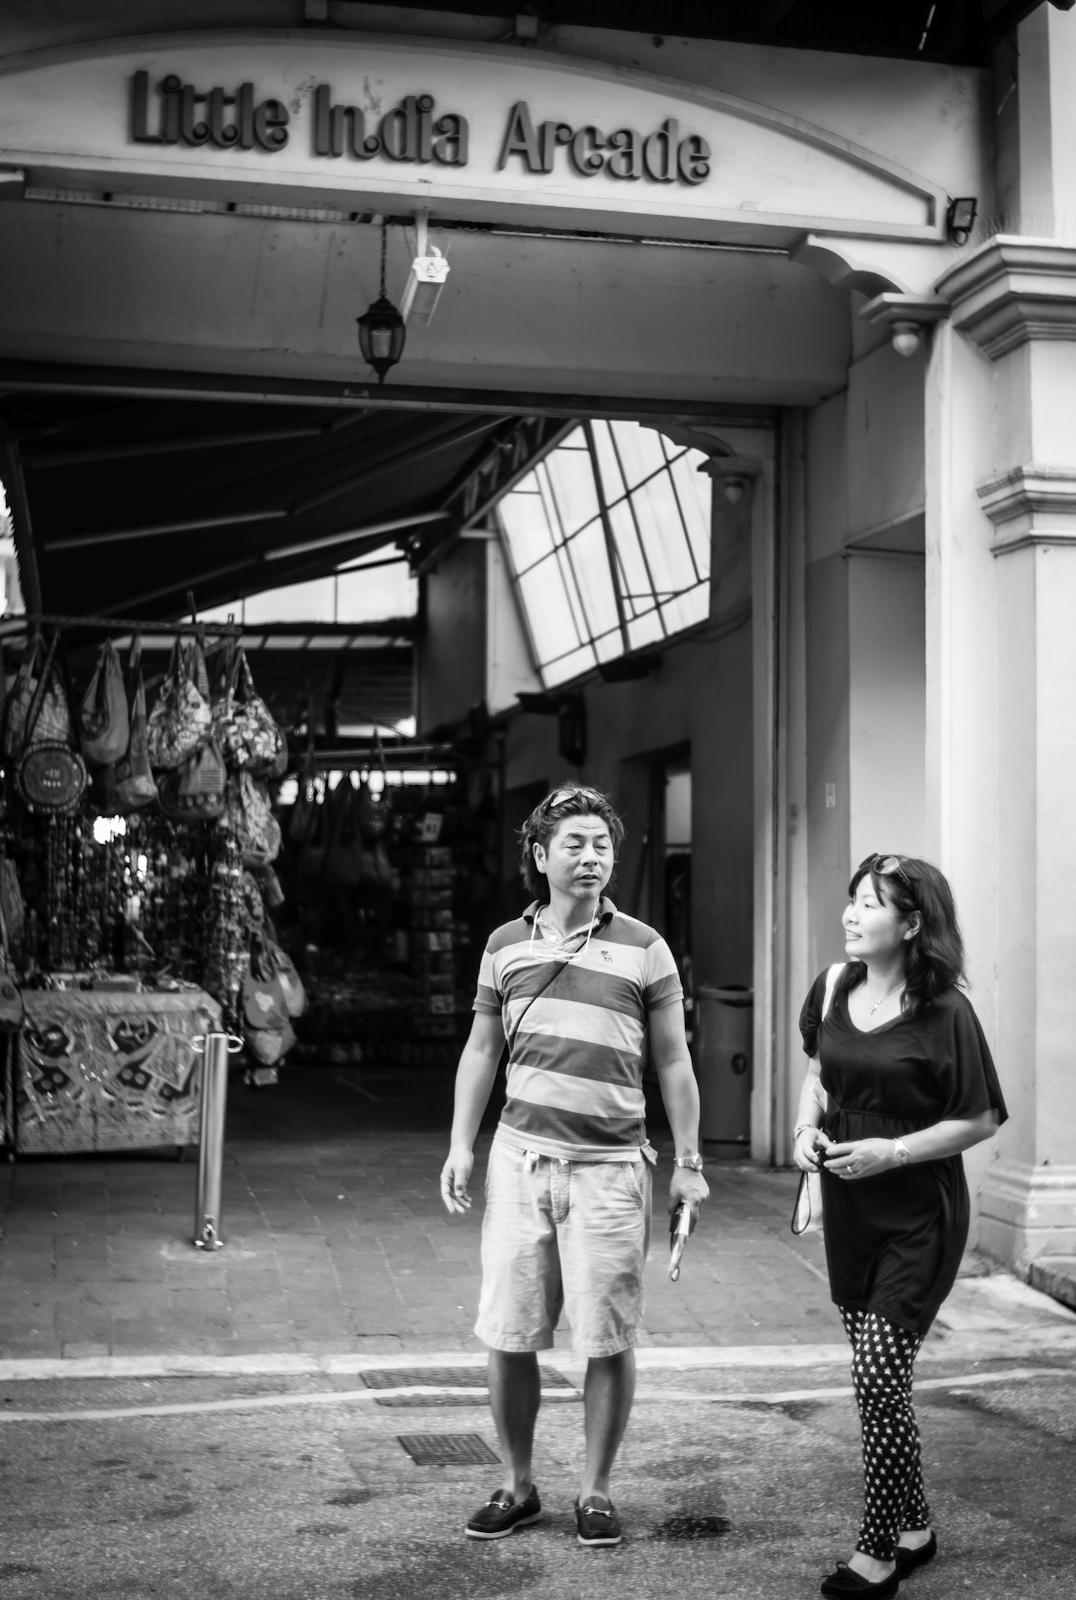 Street photography - Little India Arcade